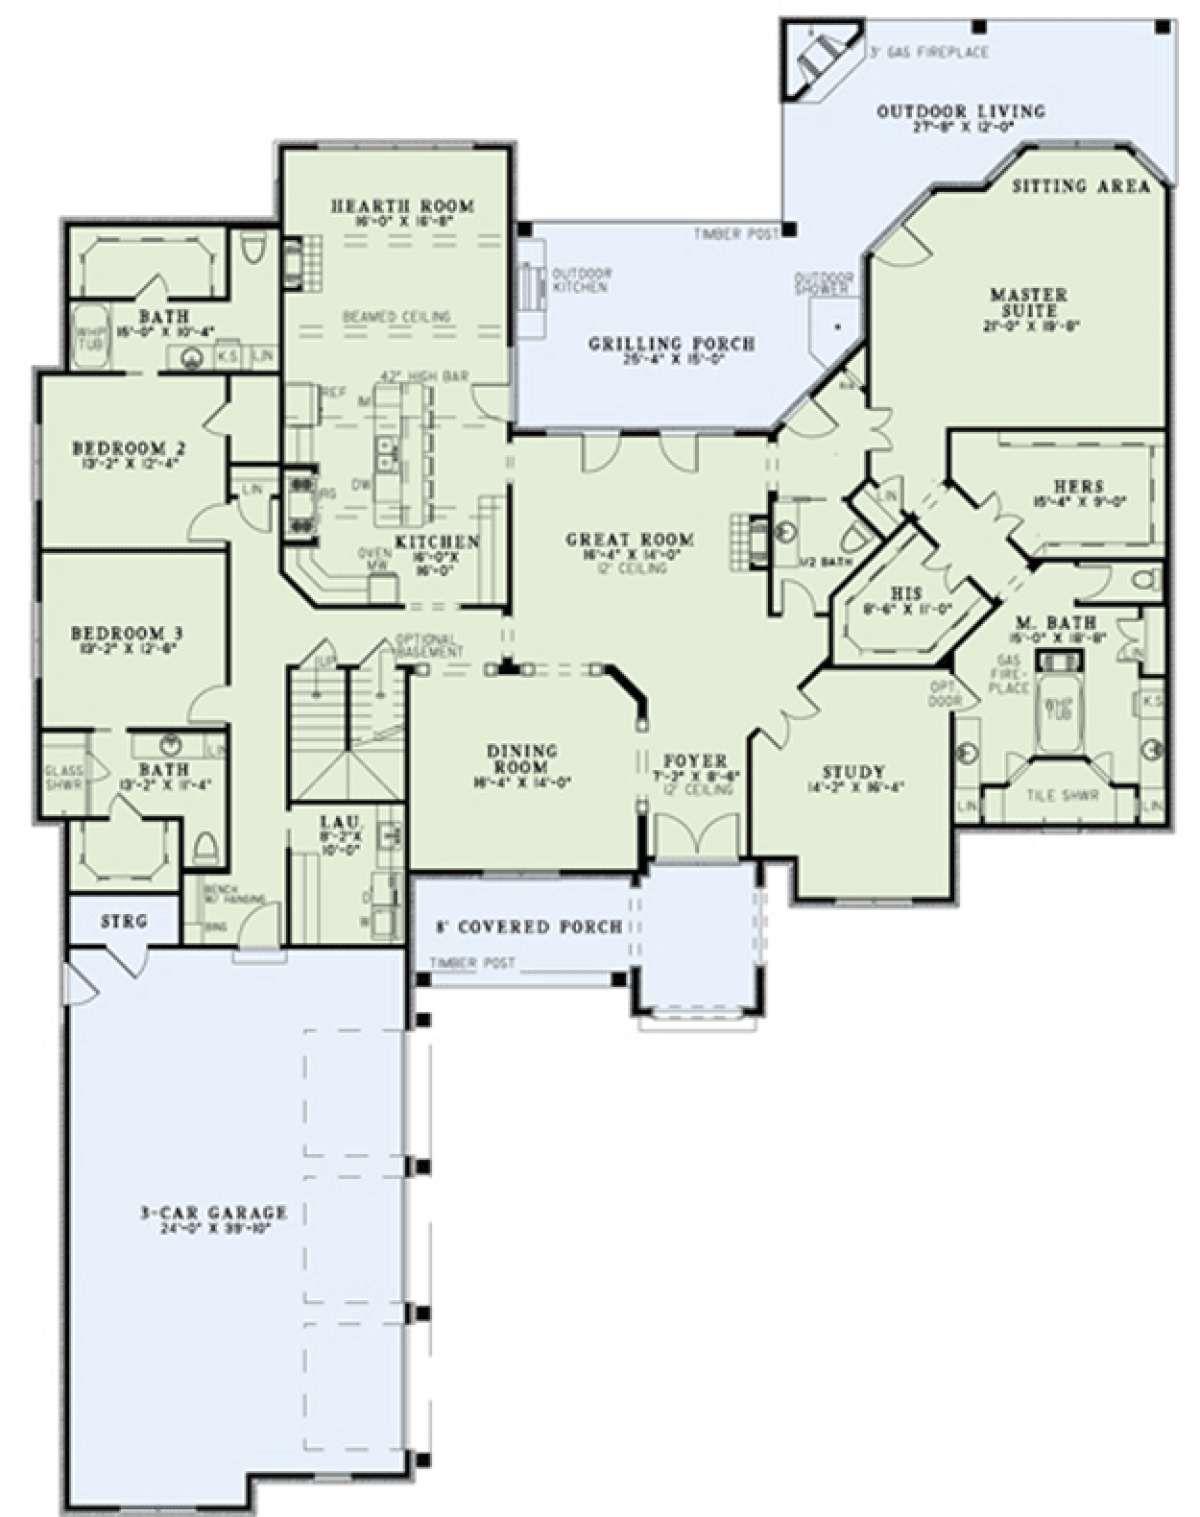 House Plan 110 00894 Luxury Plan 4 215 Square Feet Luxury House Plans House Plans And More House Layouts